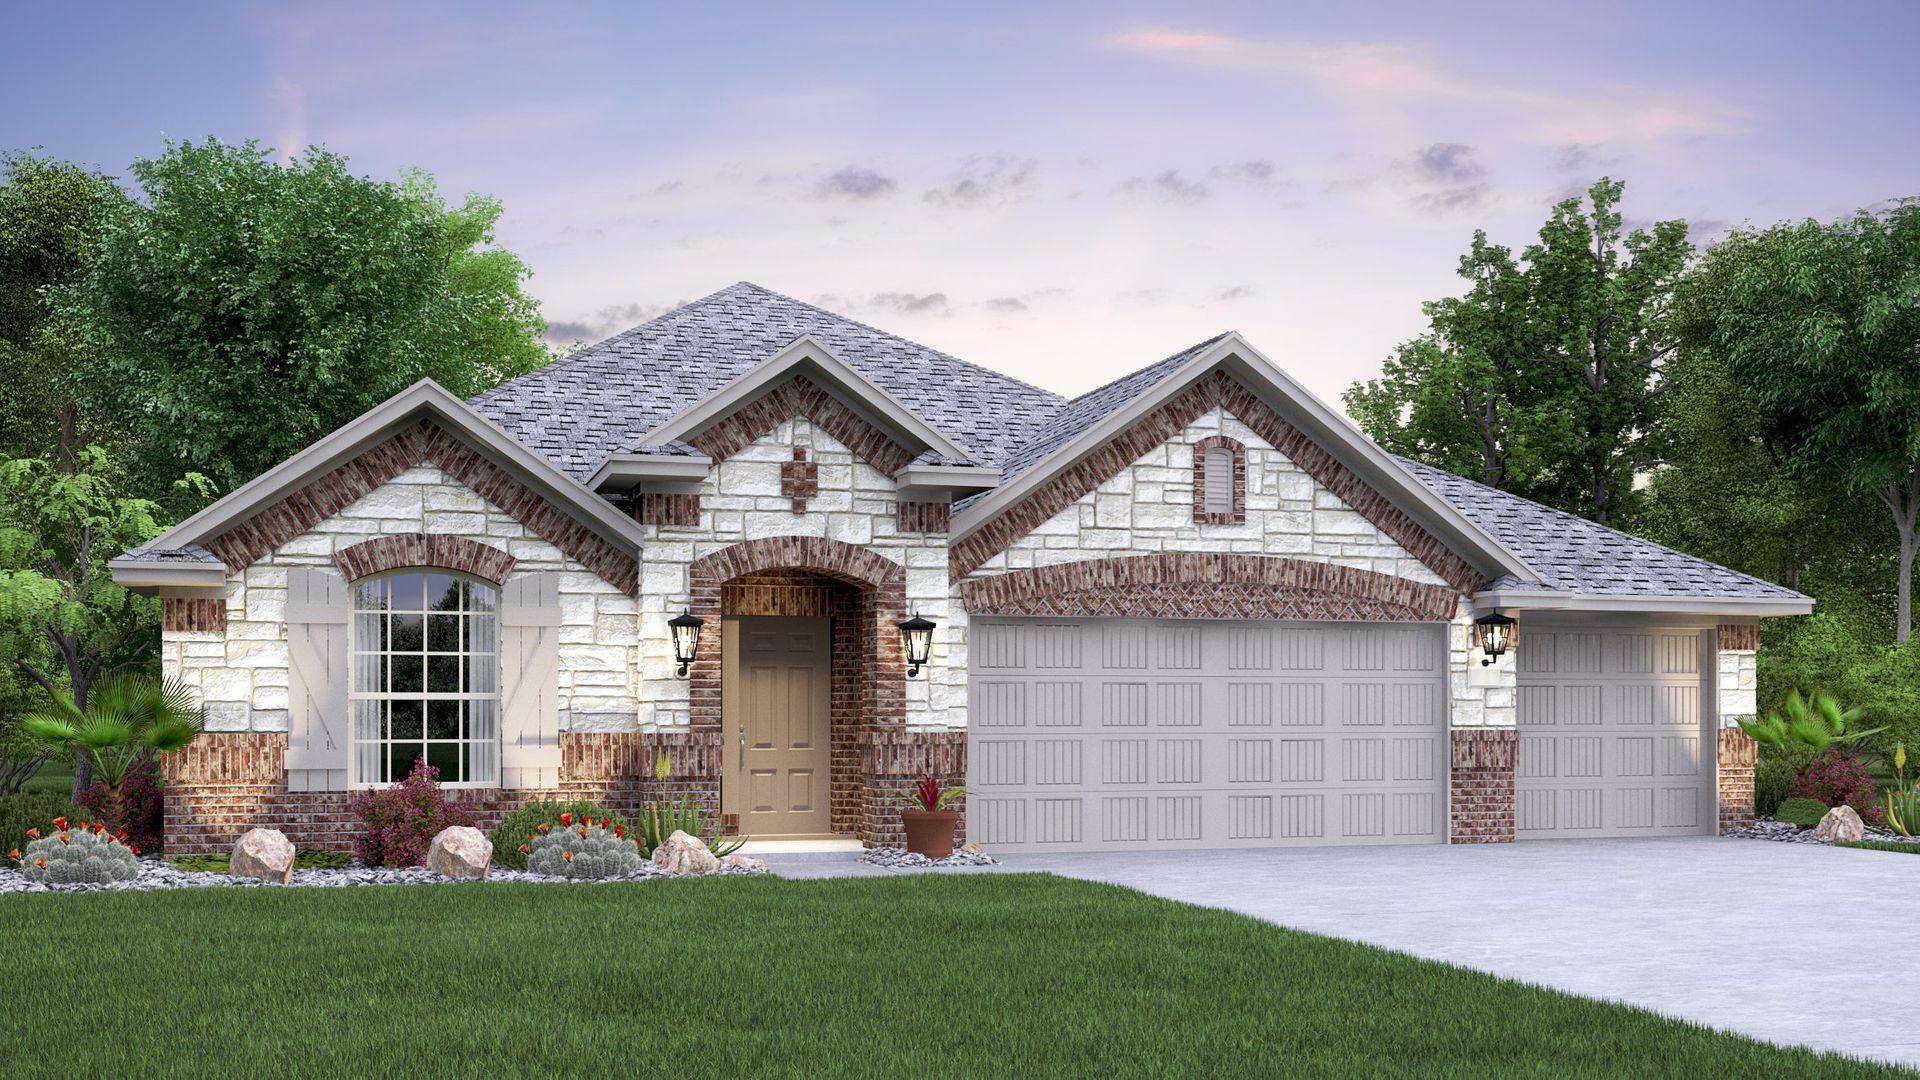 Large Garage San Antonio Real Estate San Antonio Tx Homes For